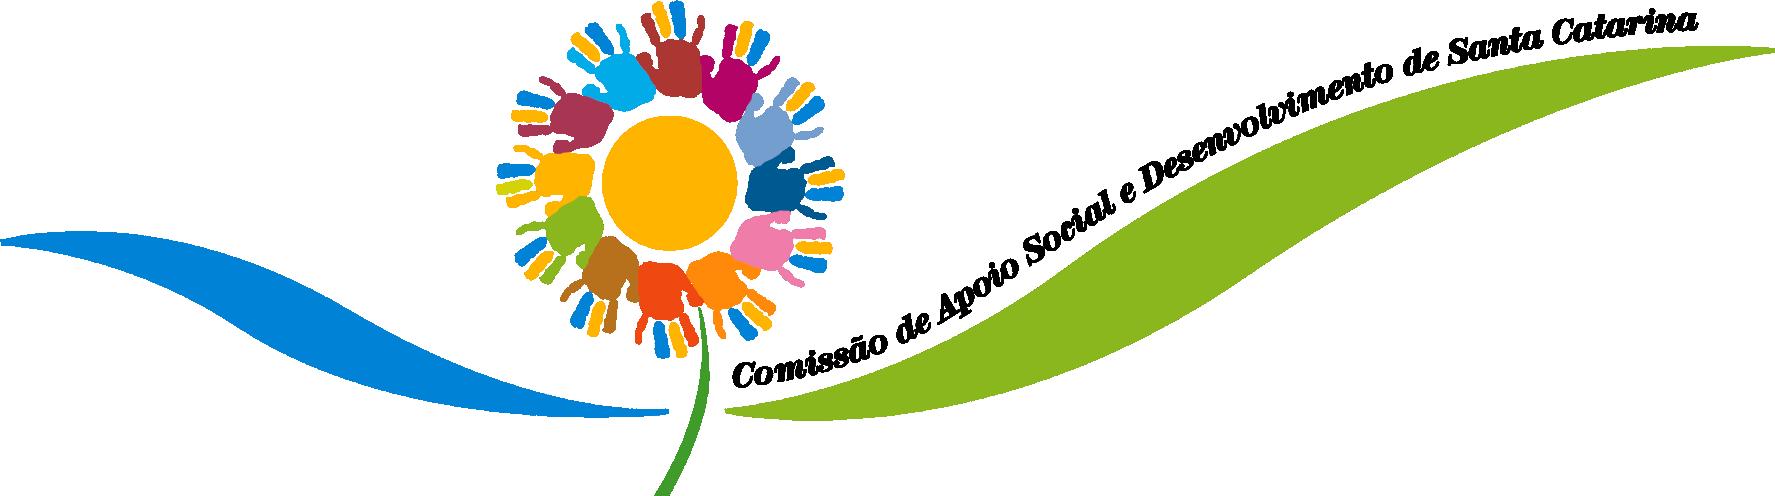 Comissão de Apoio Social e Desenvolvimento de Santa Catarina